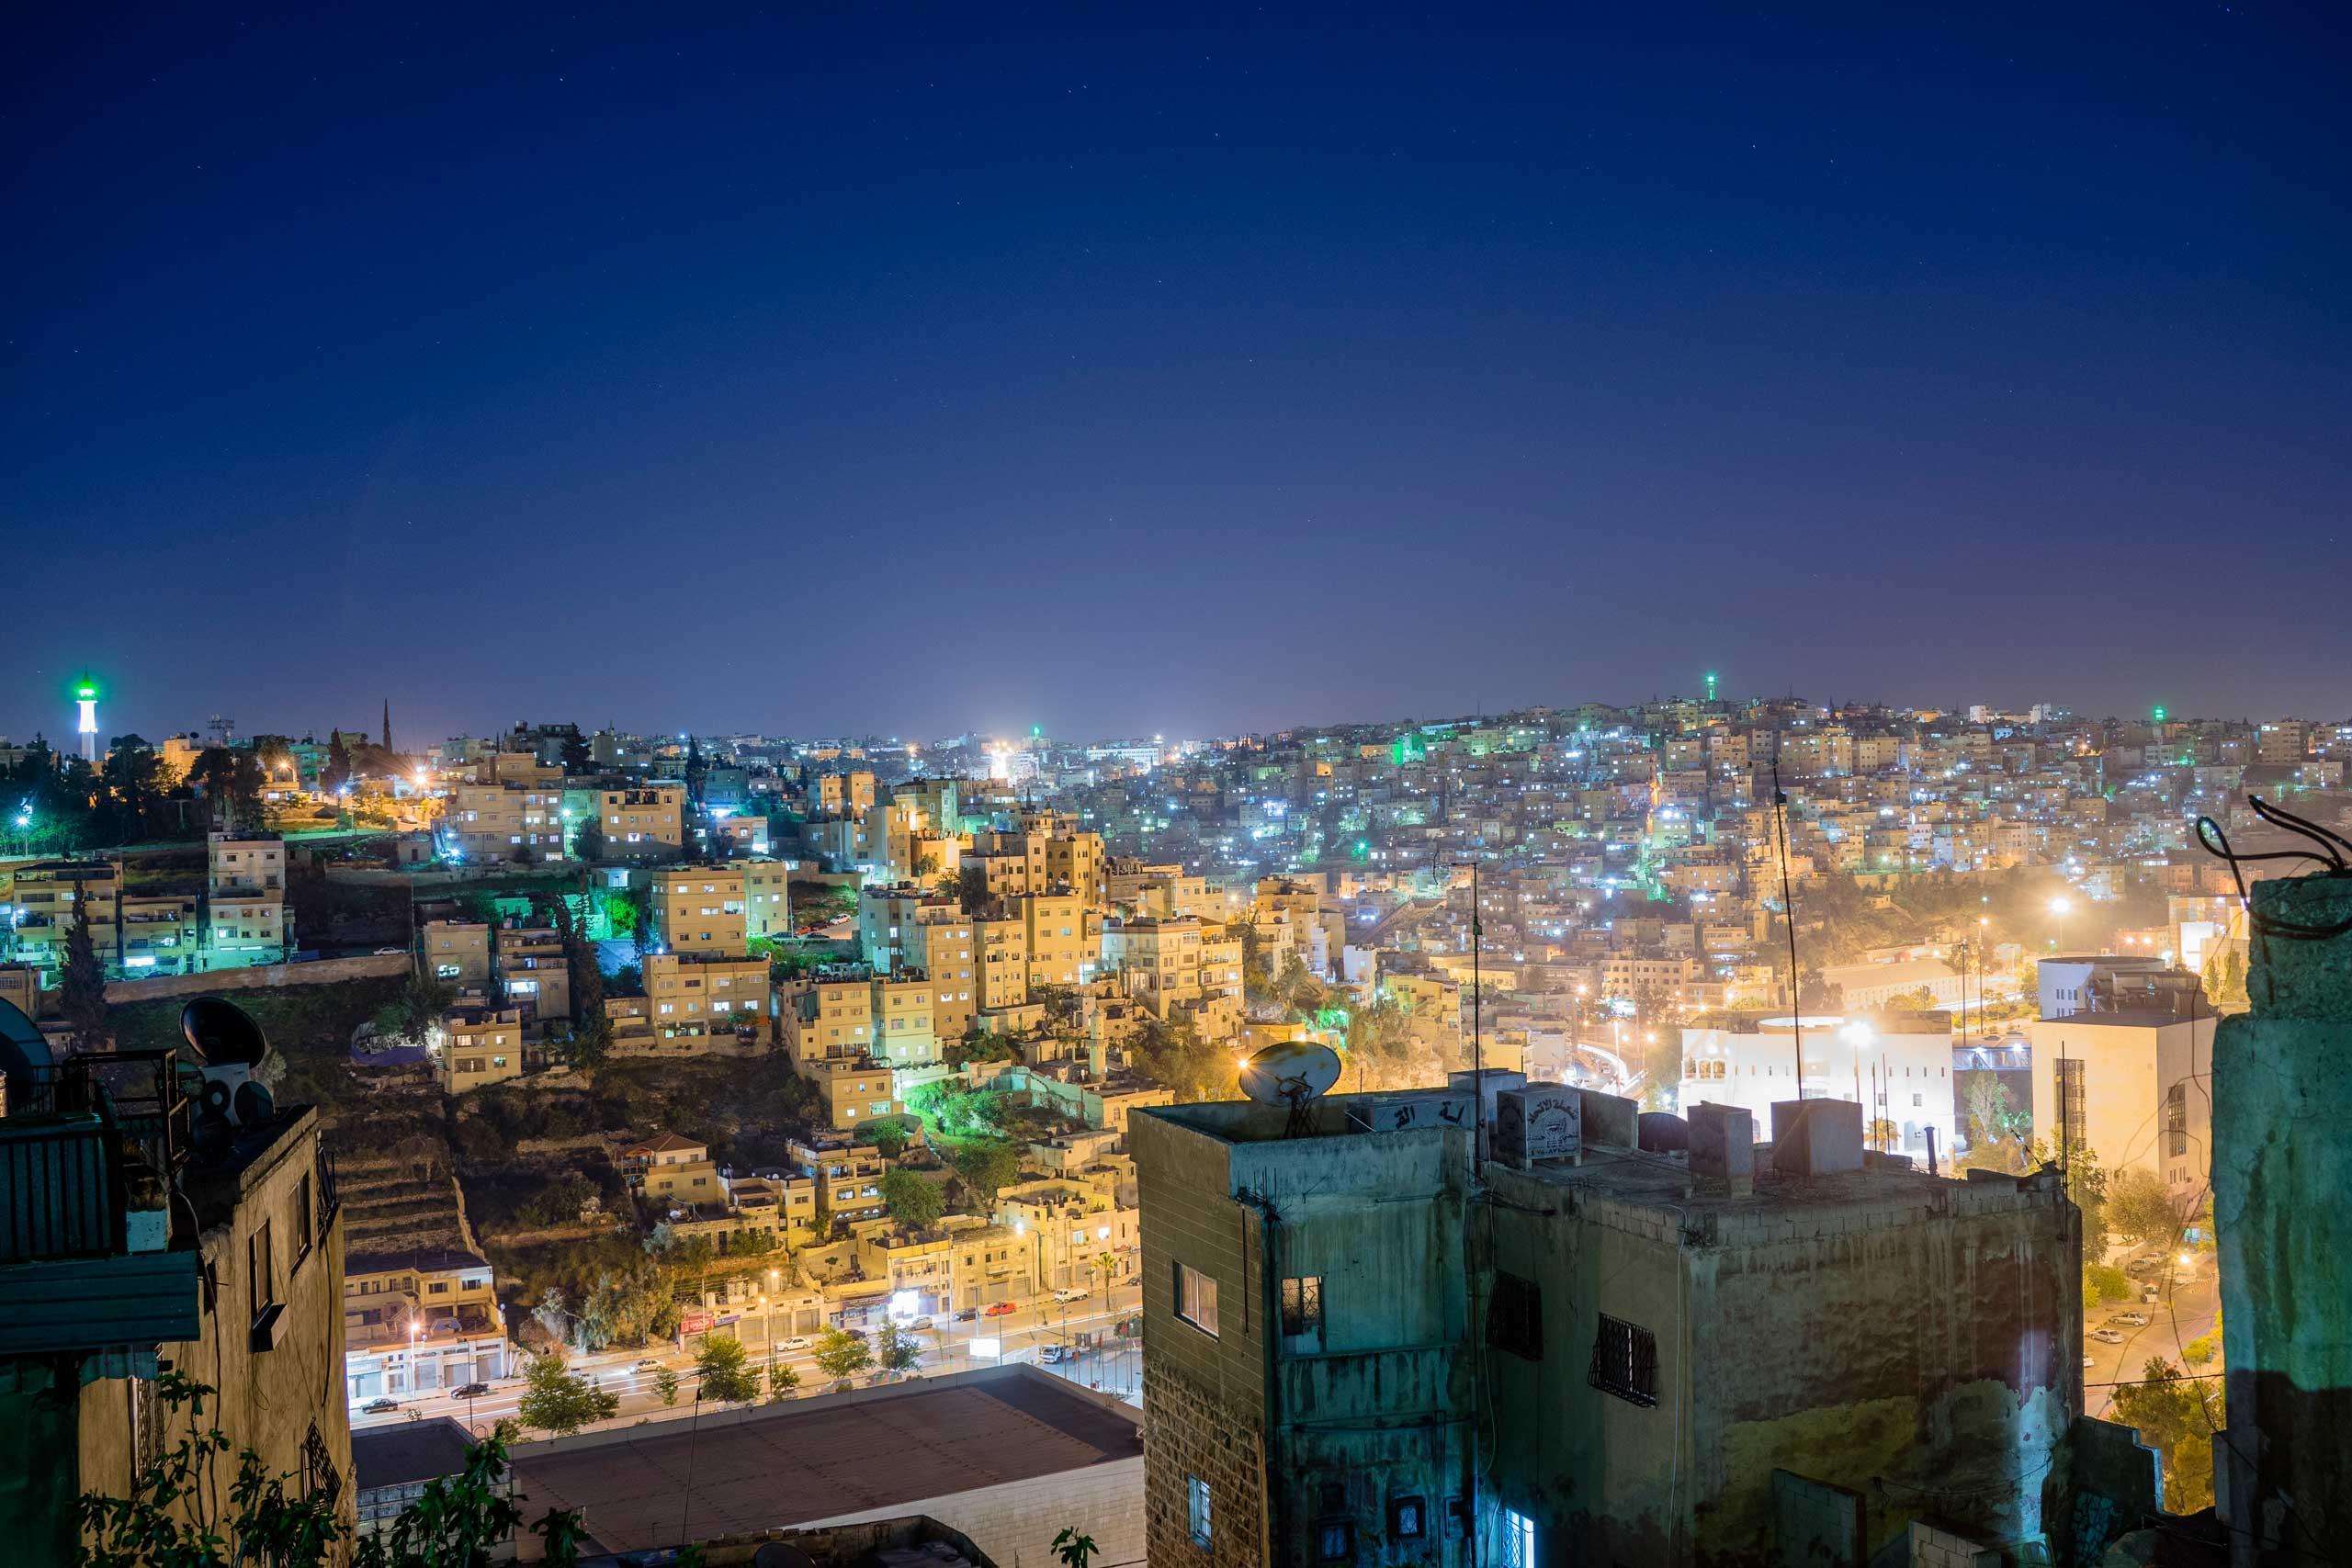 Amman, Jordan at night.